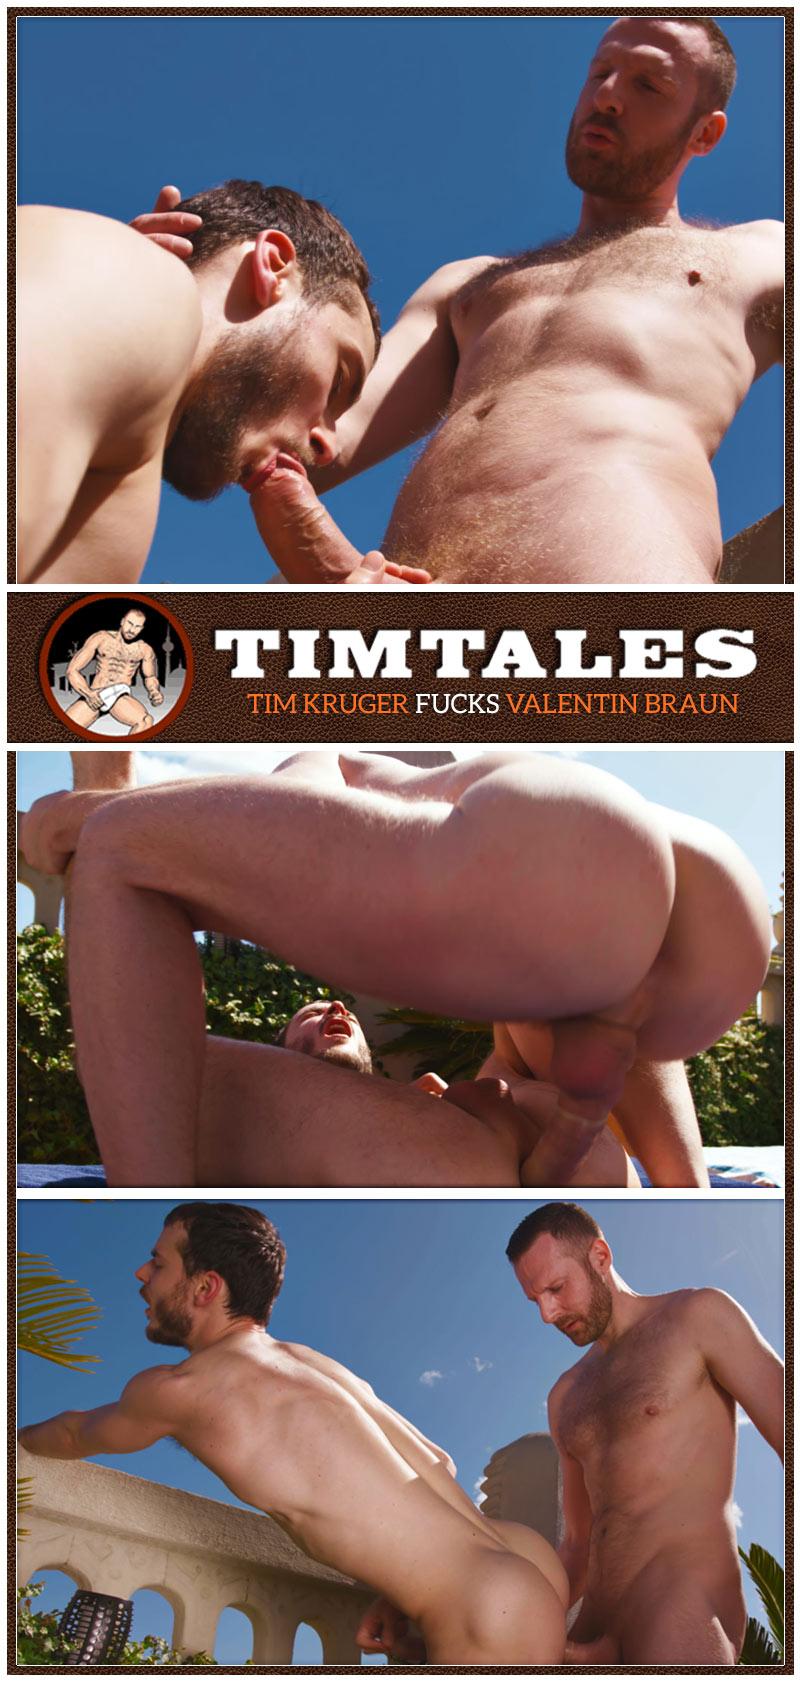 Tim Kruger Fucks Valentin Braun at TimTales